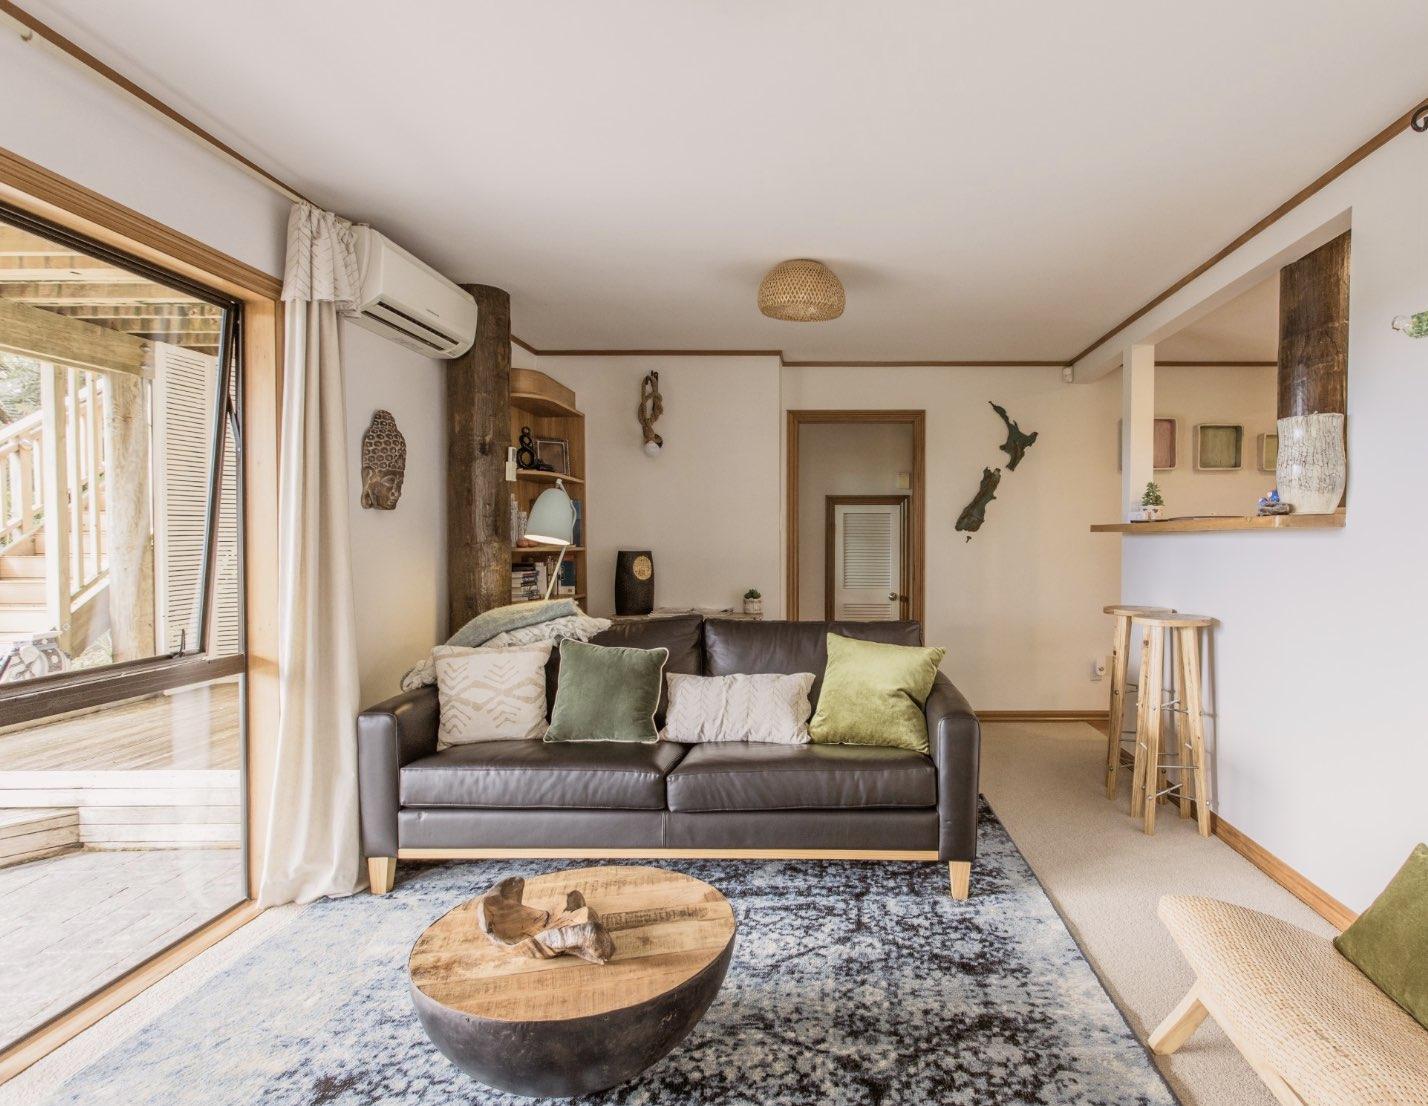 Best Airbnbs in Auckland, NZ